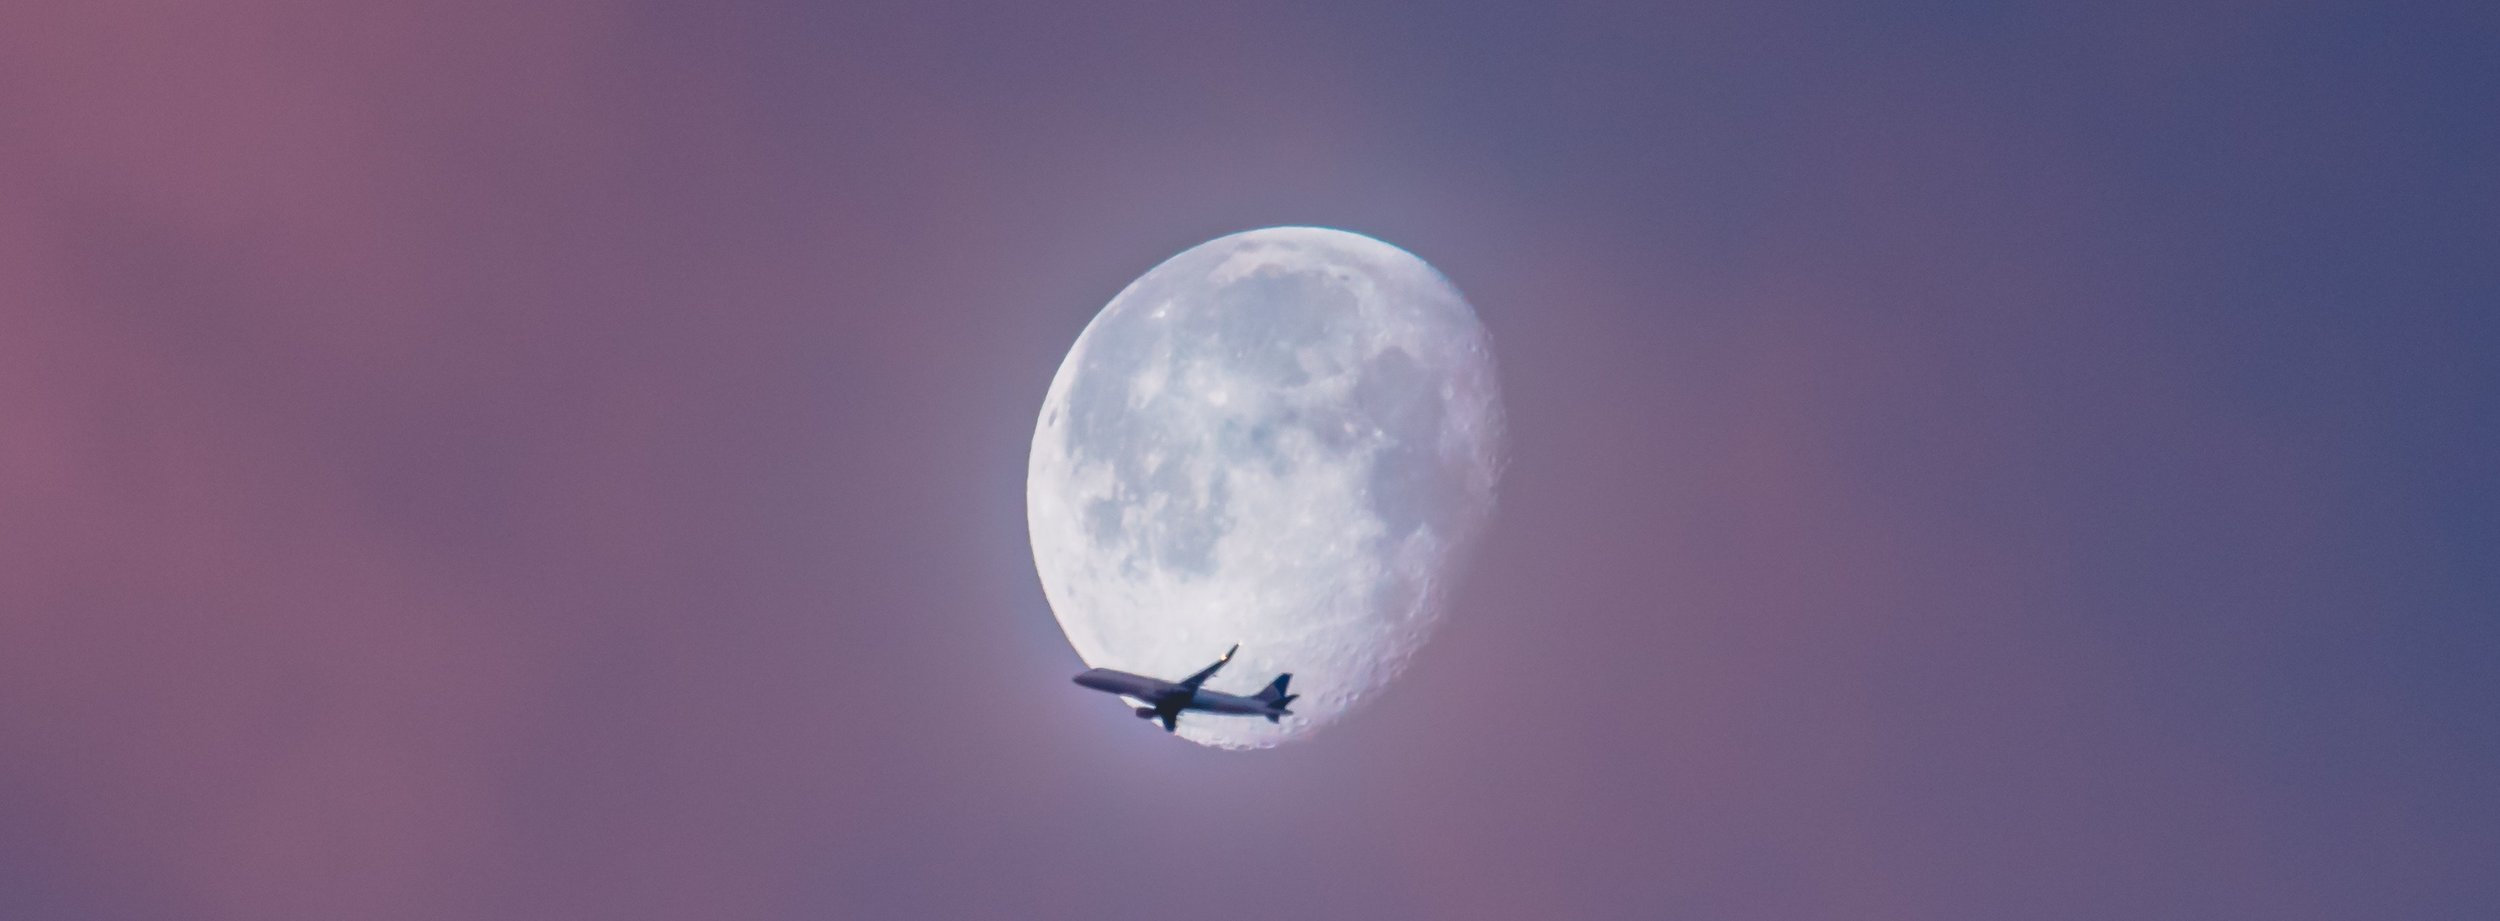 airplane-ian-simmonds-274494.4d2cfc91888b414faec07c0cbaf5c2dc.jpg